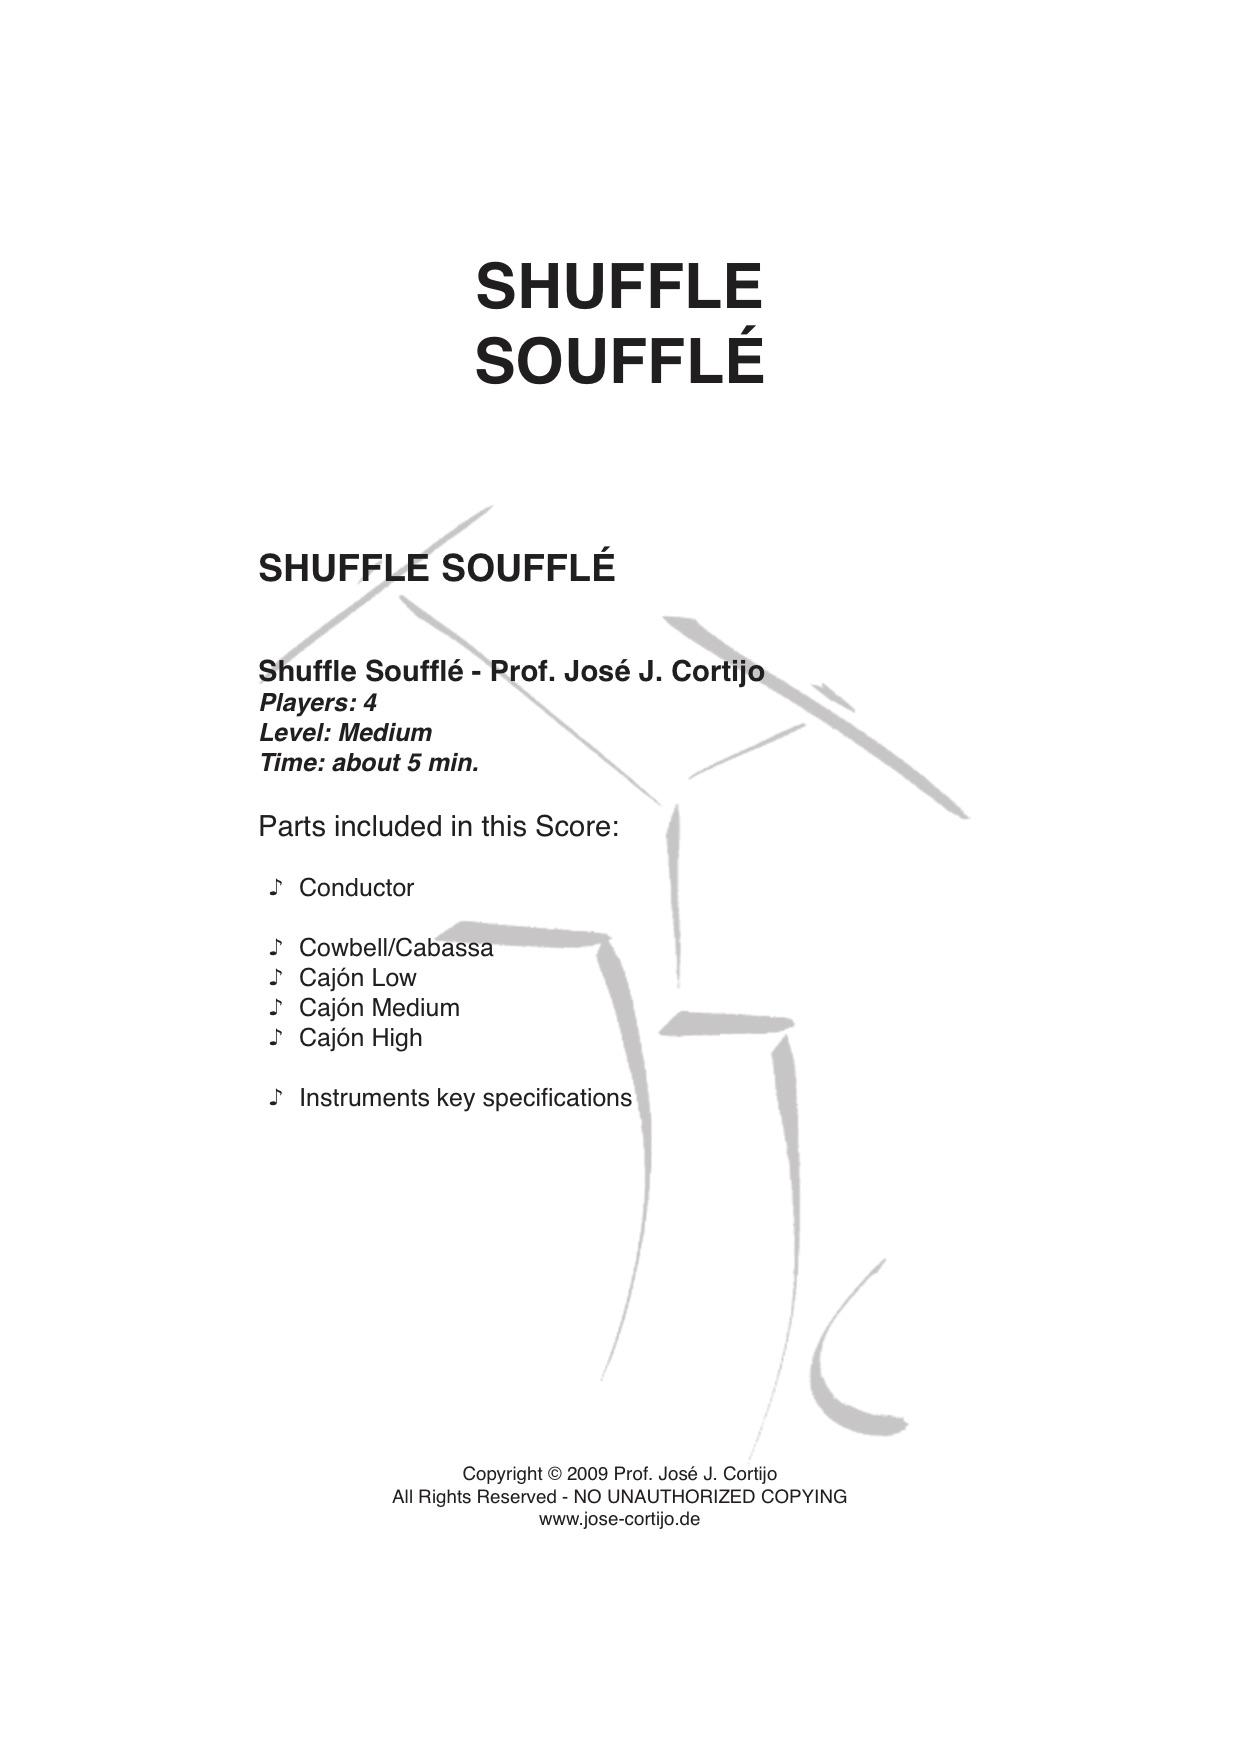 Suffle Soufflé